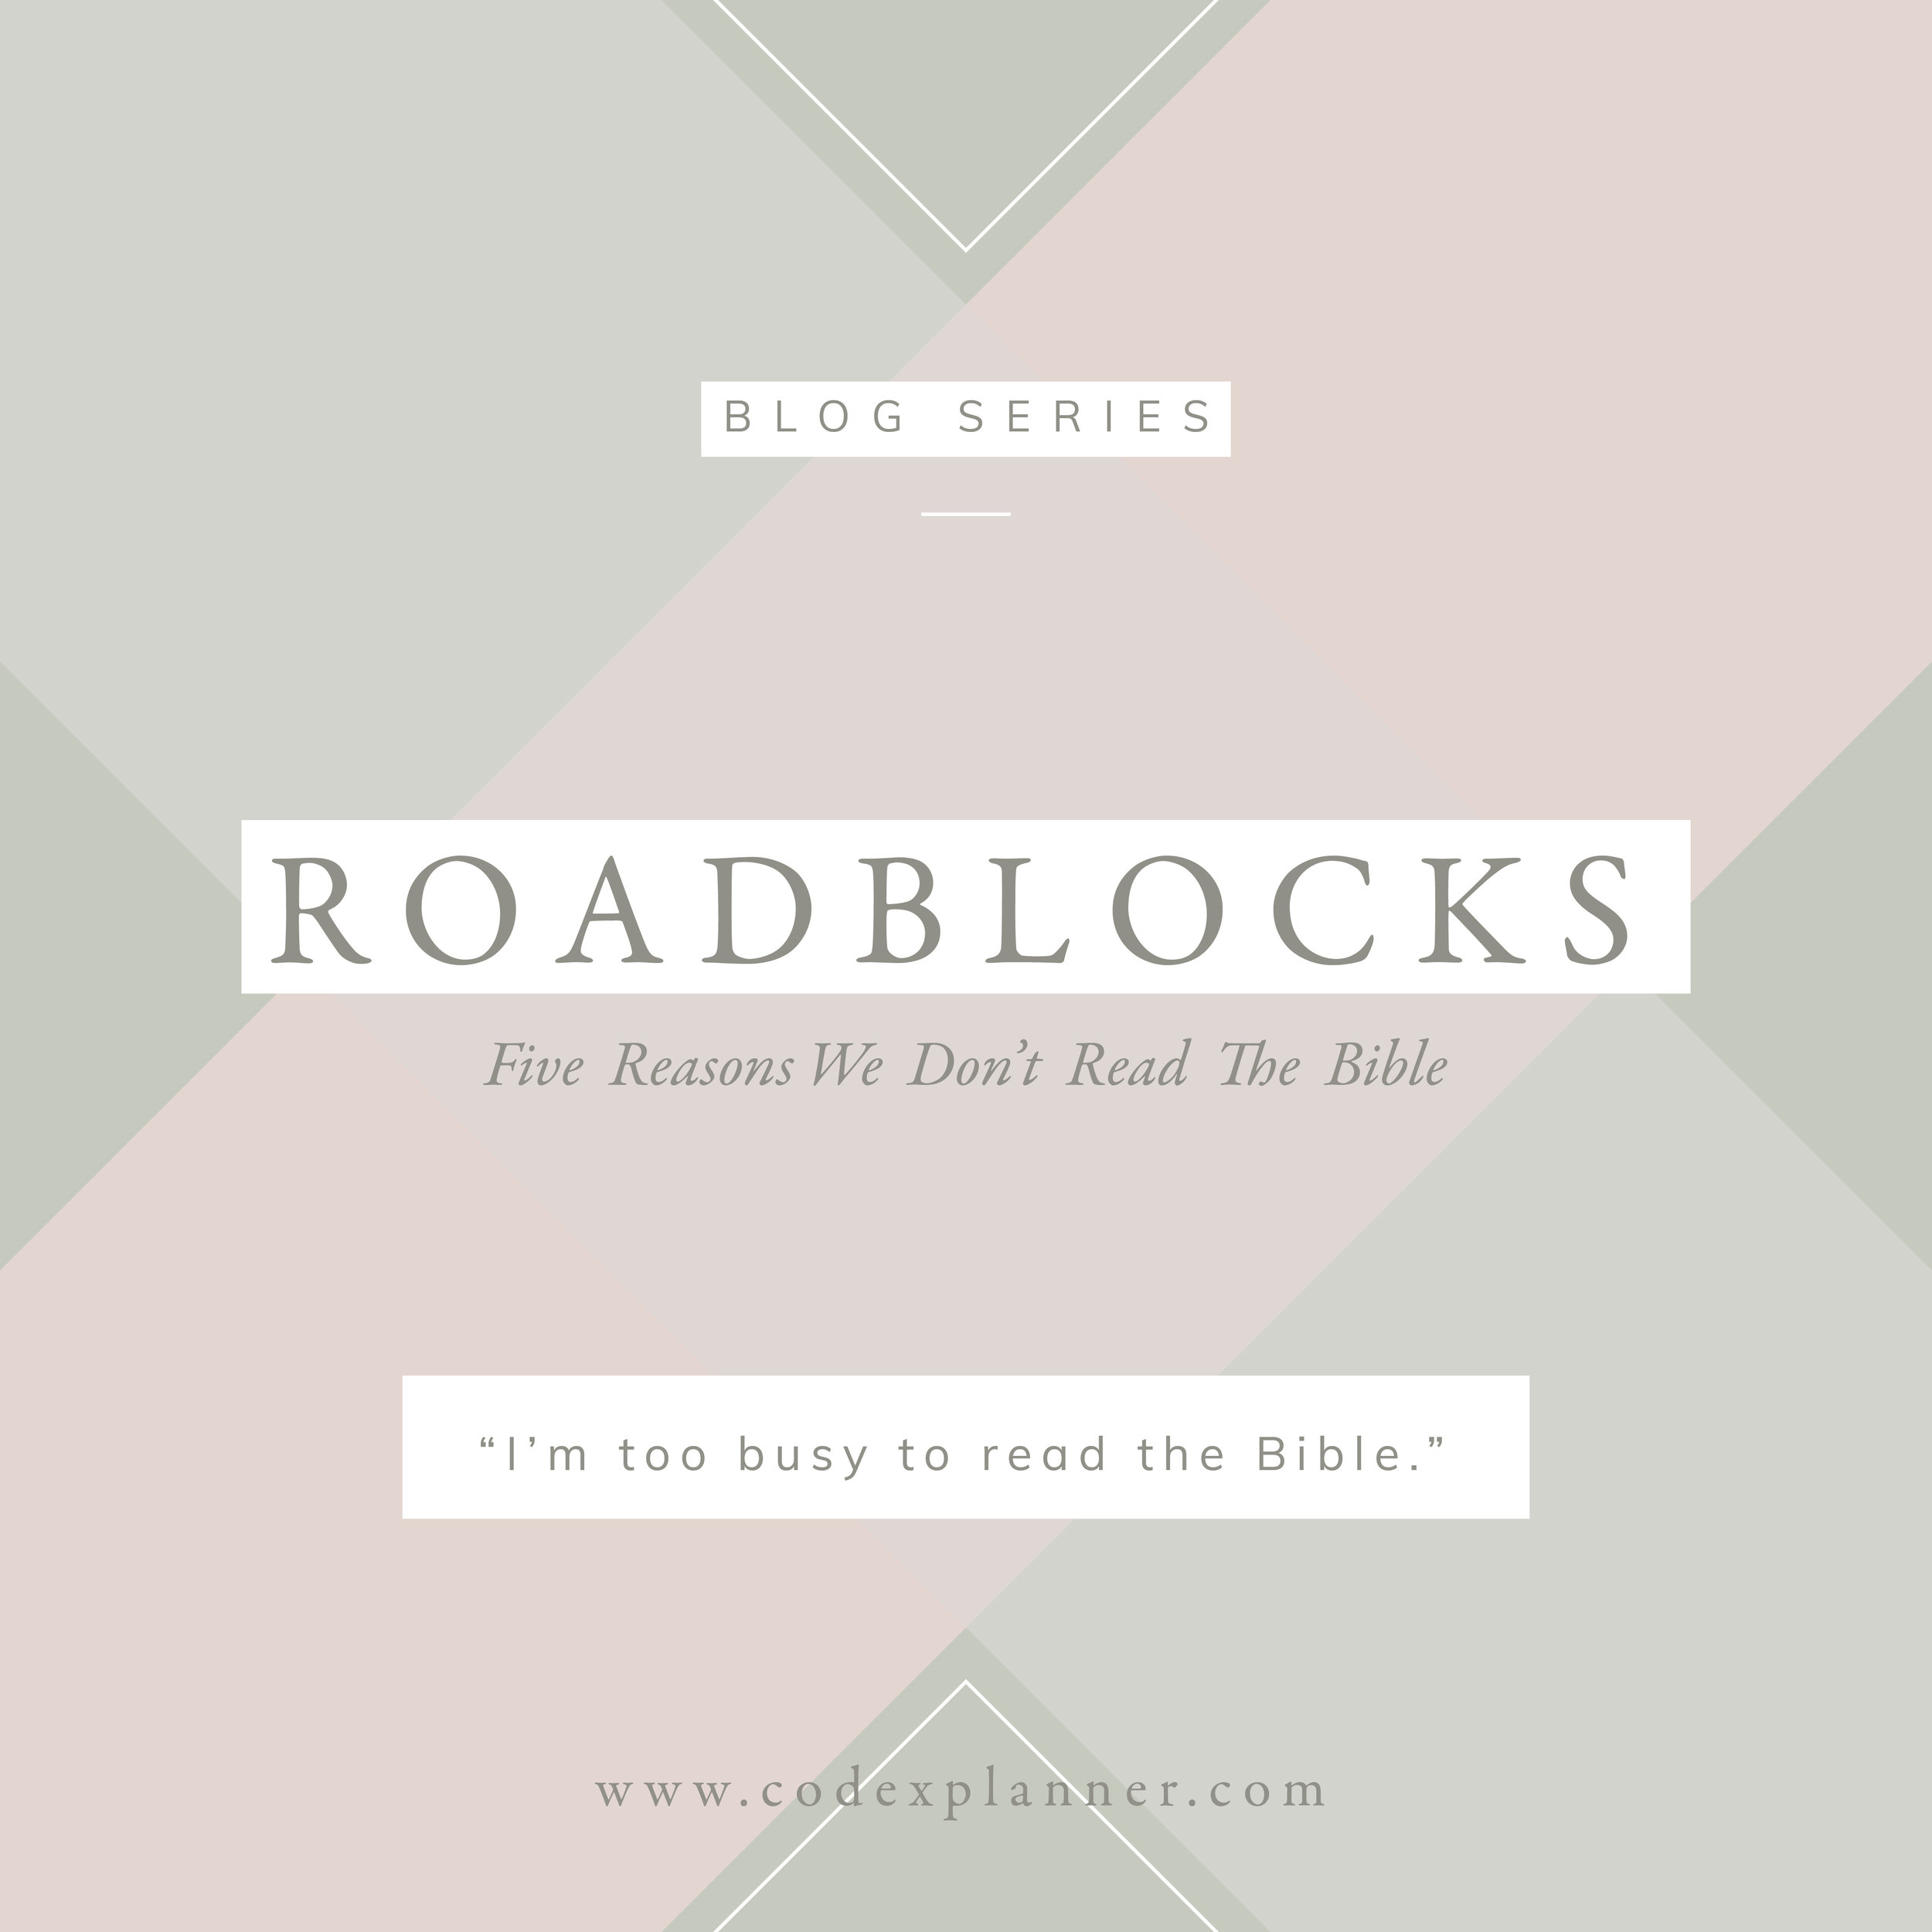 roadblock_Square 5_priority_Square 5_Square 5_Square 5.jpg